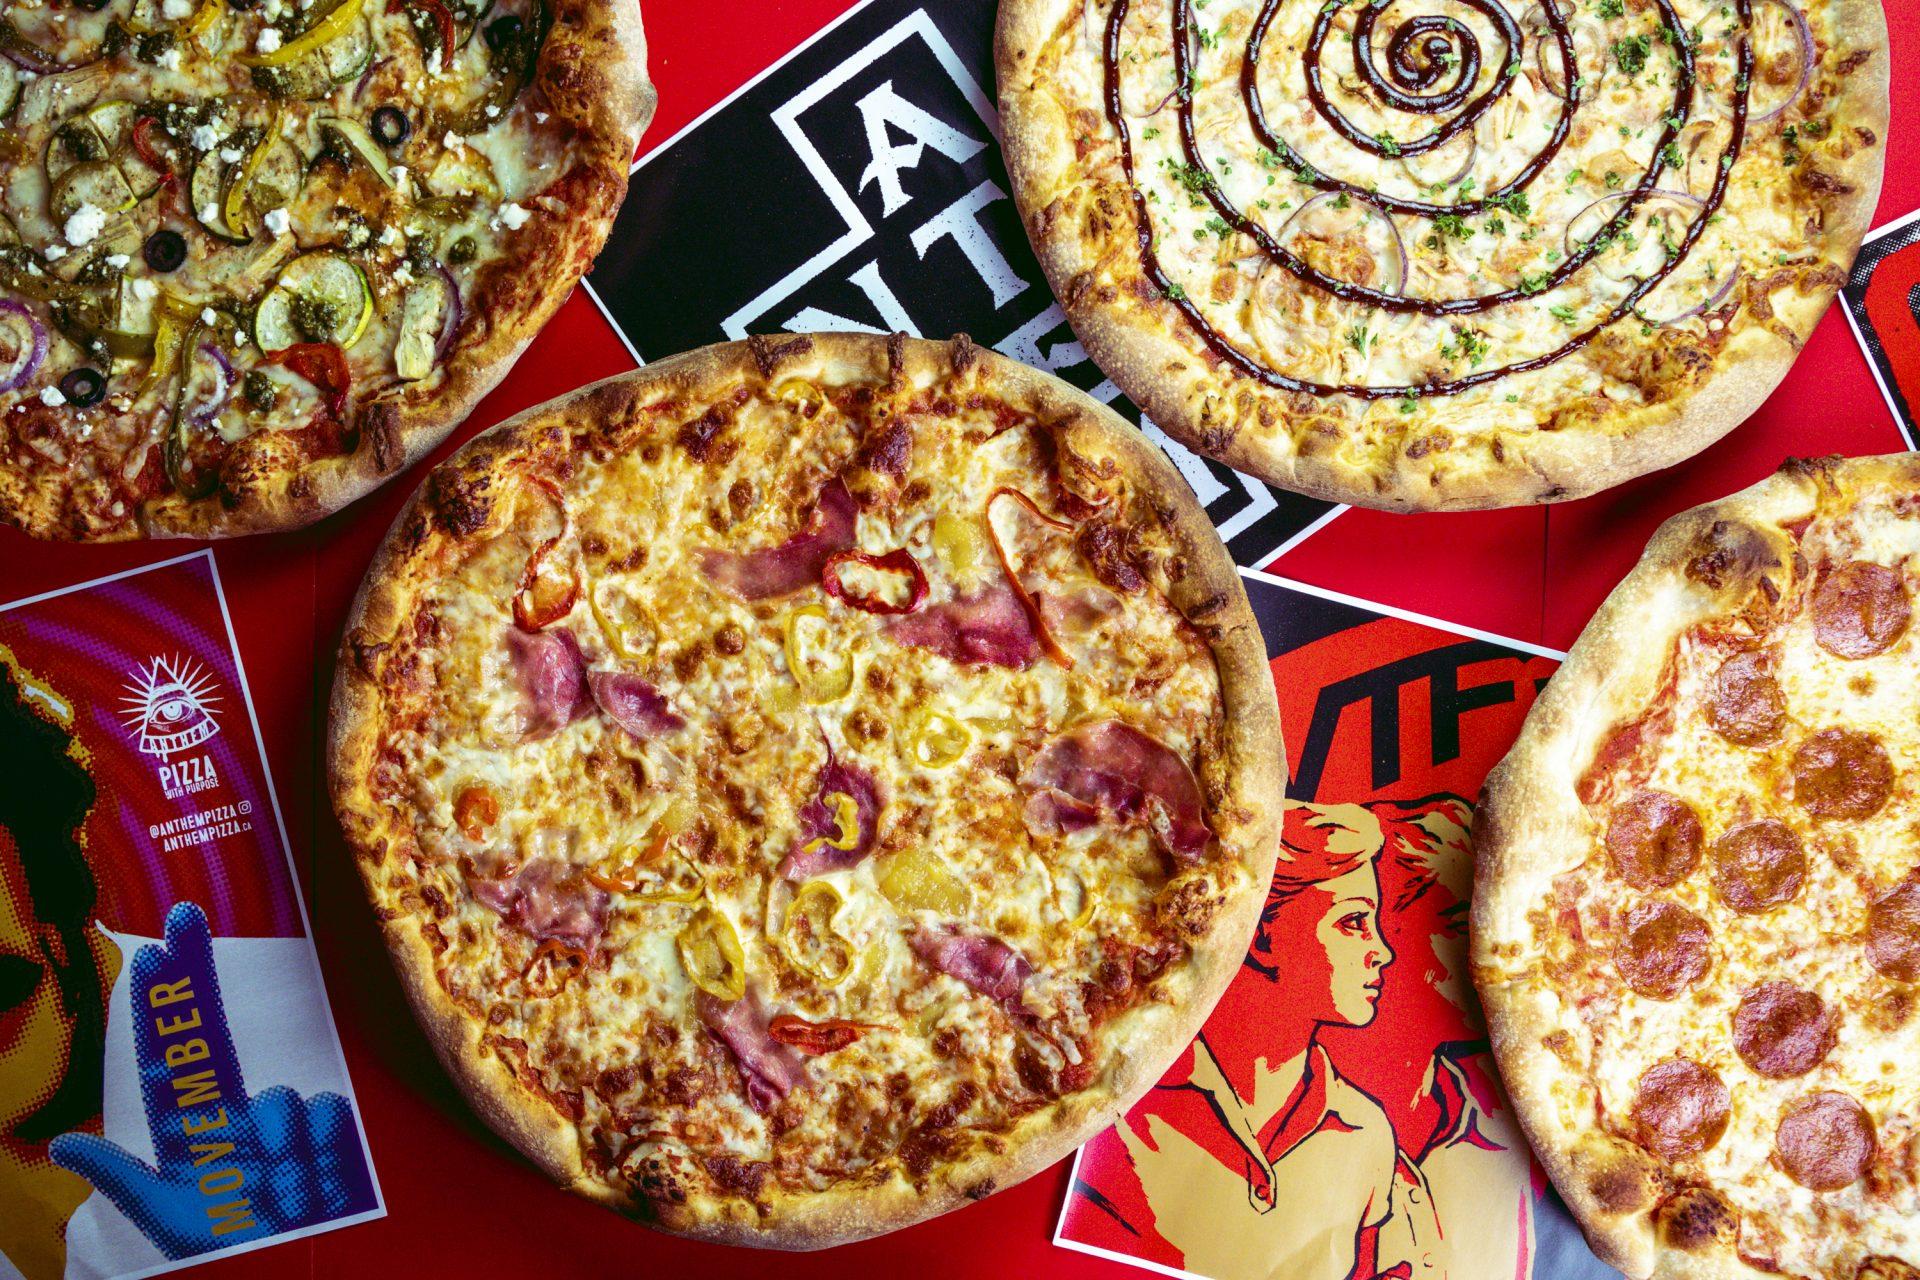 Anthem Pizza